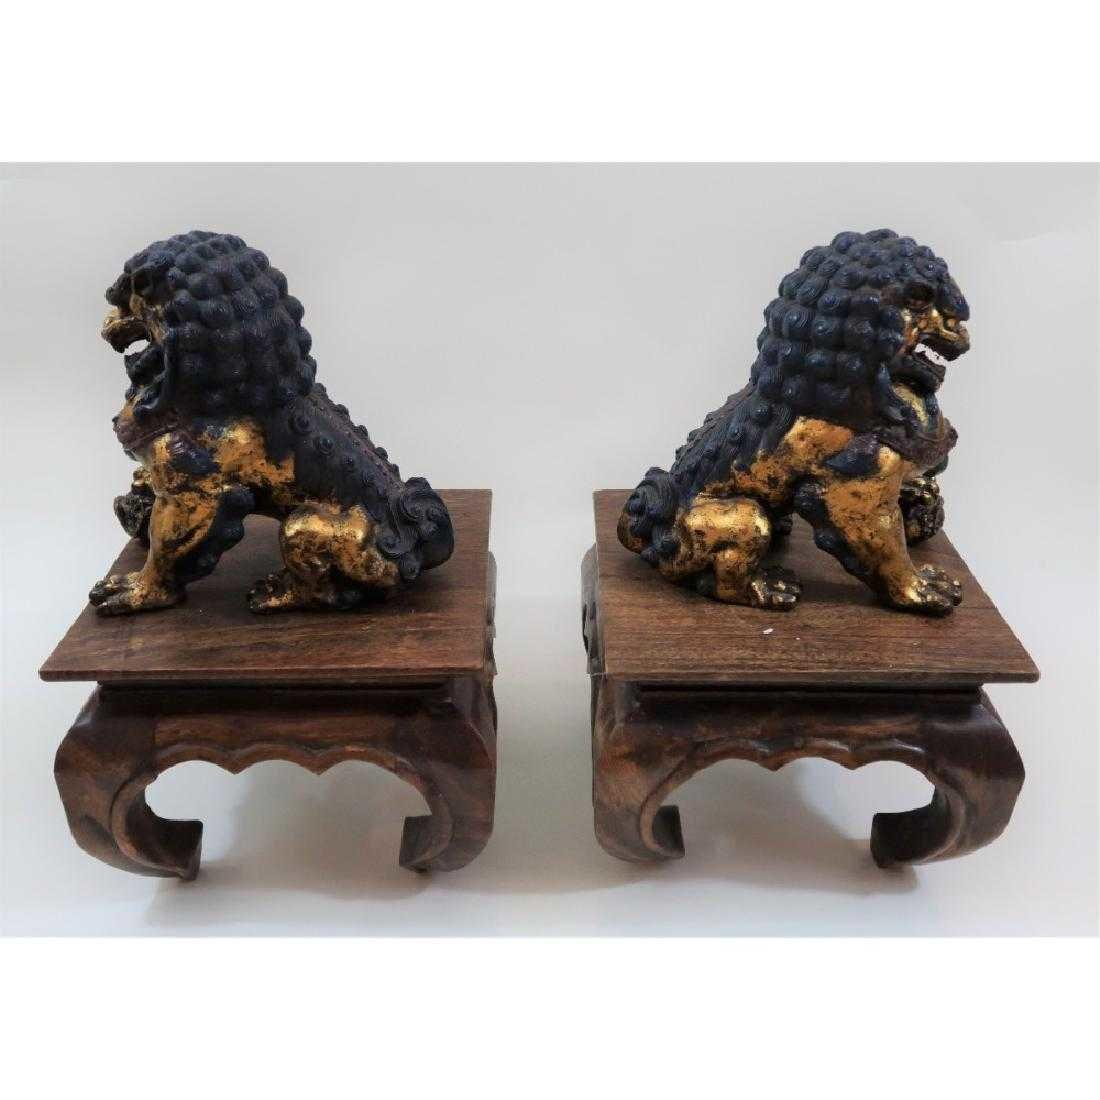 Pair of iron foo dogs 1800s - 3